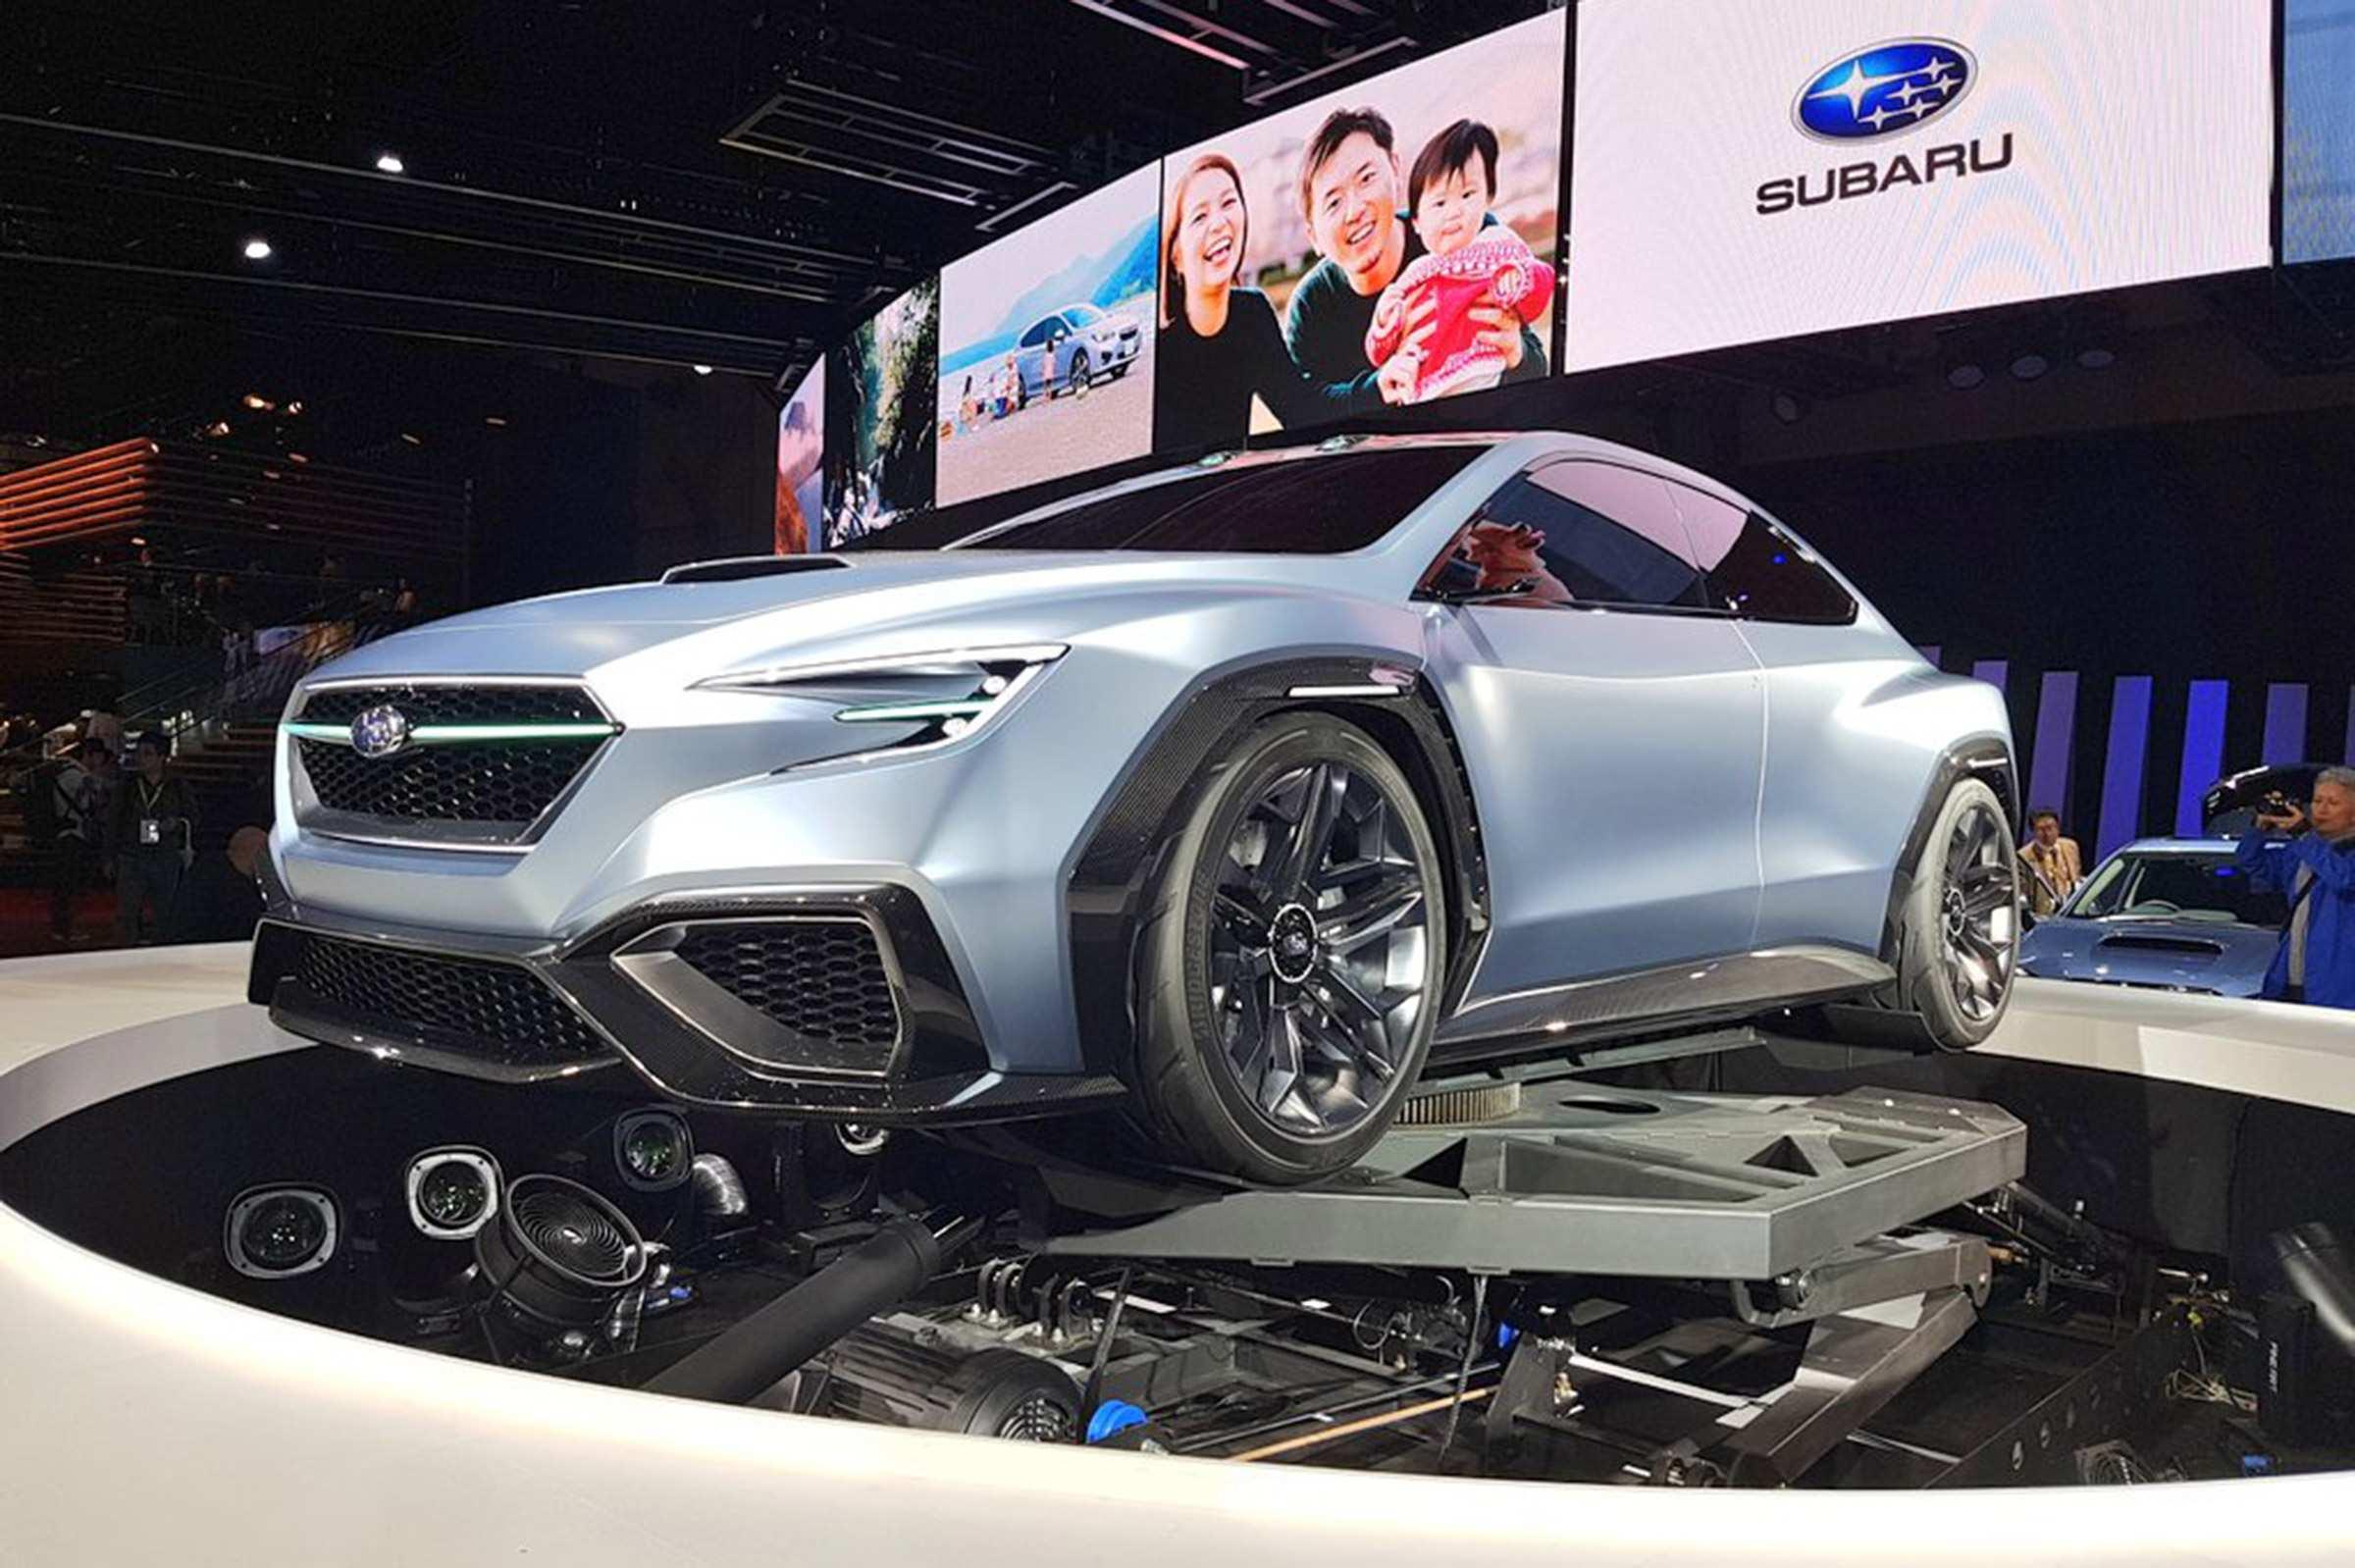 57 Concept of 2020 Subaru Wrx Series Gray Exterior and Interior for 2020 Subaru Wrx Series Gray